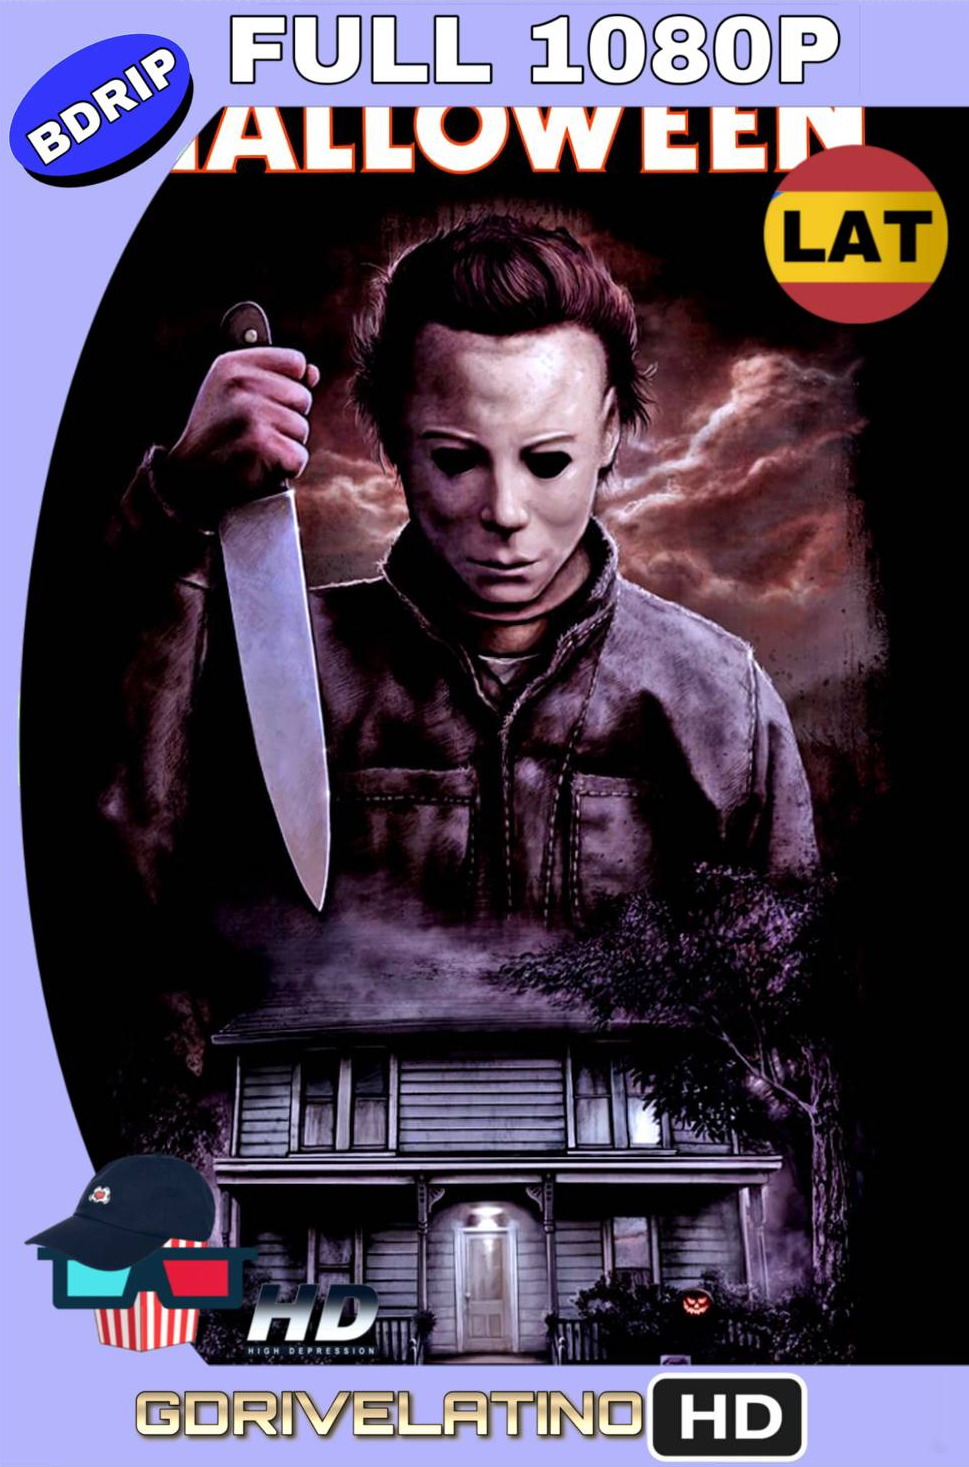 Halloween (1978) BDRip FULL 1080p Latino-Ingles MKV